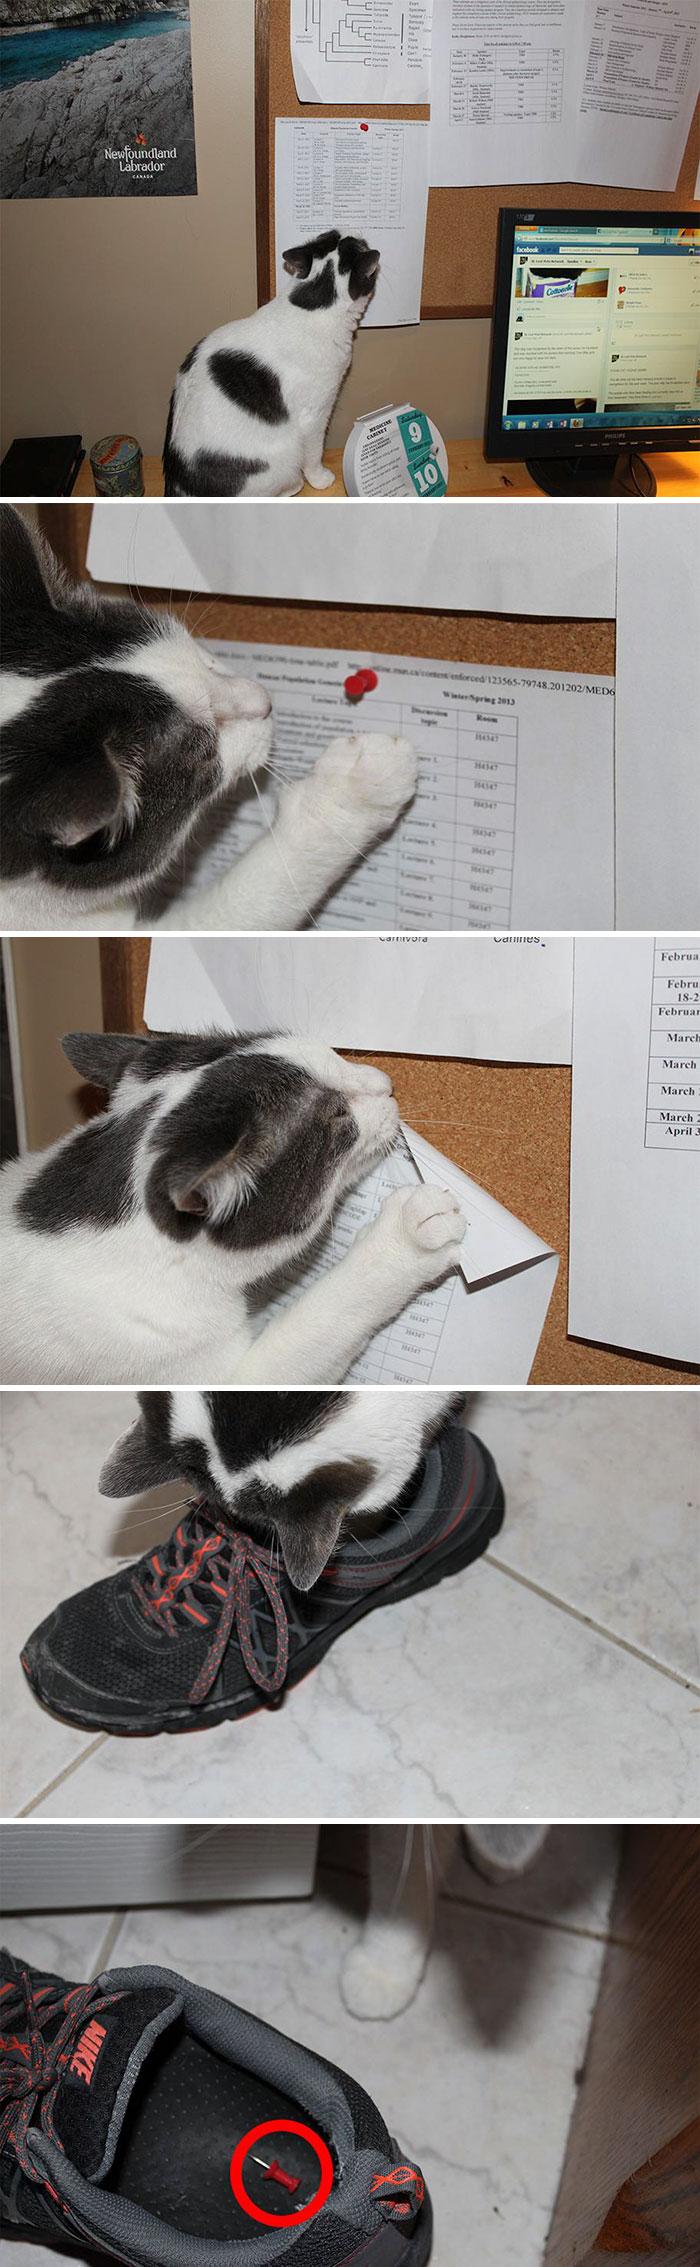 cats-causing-menace-1